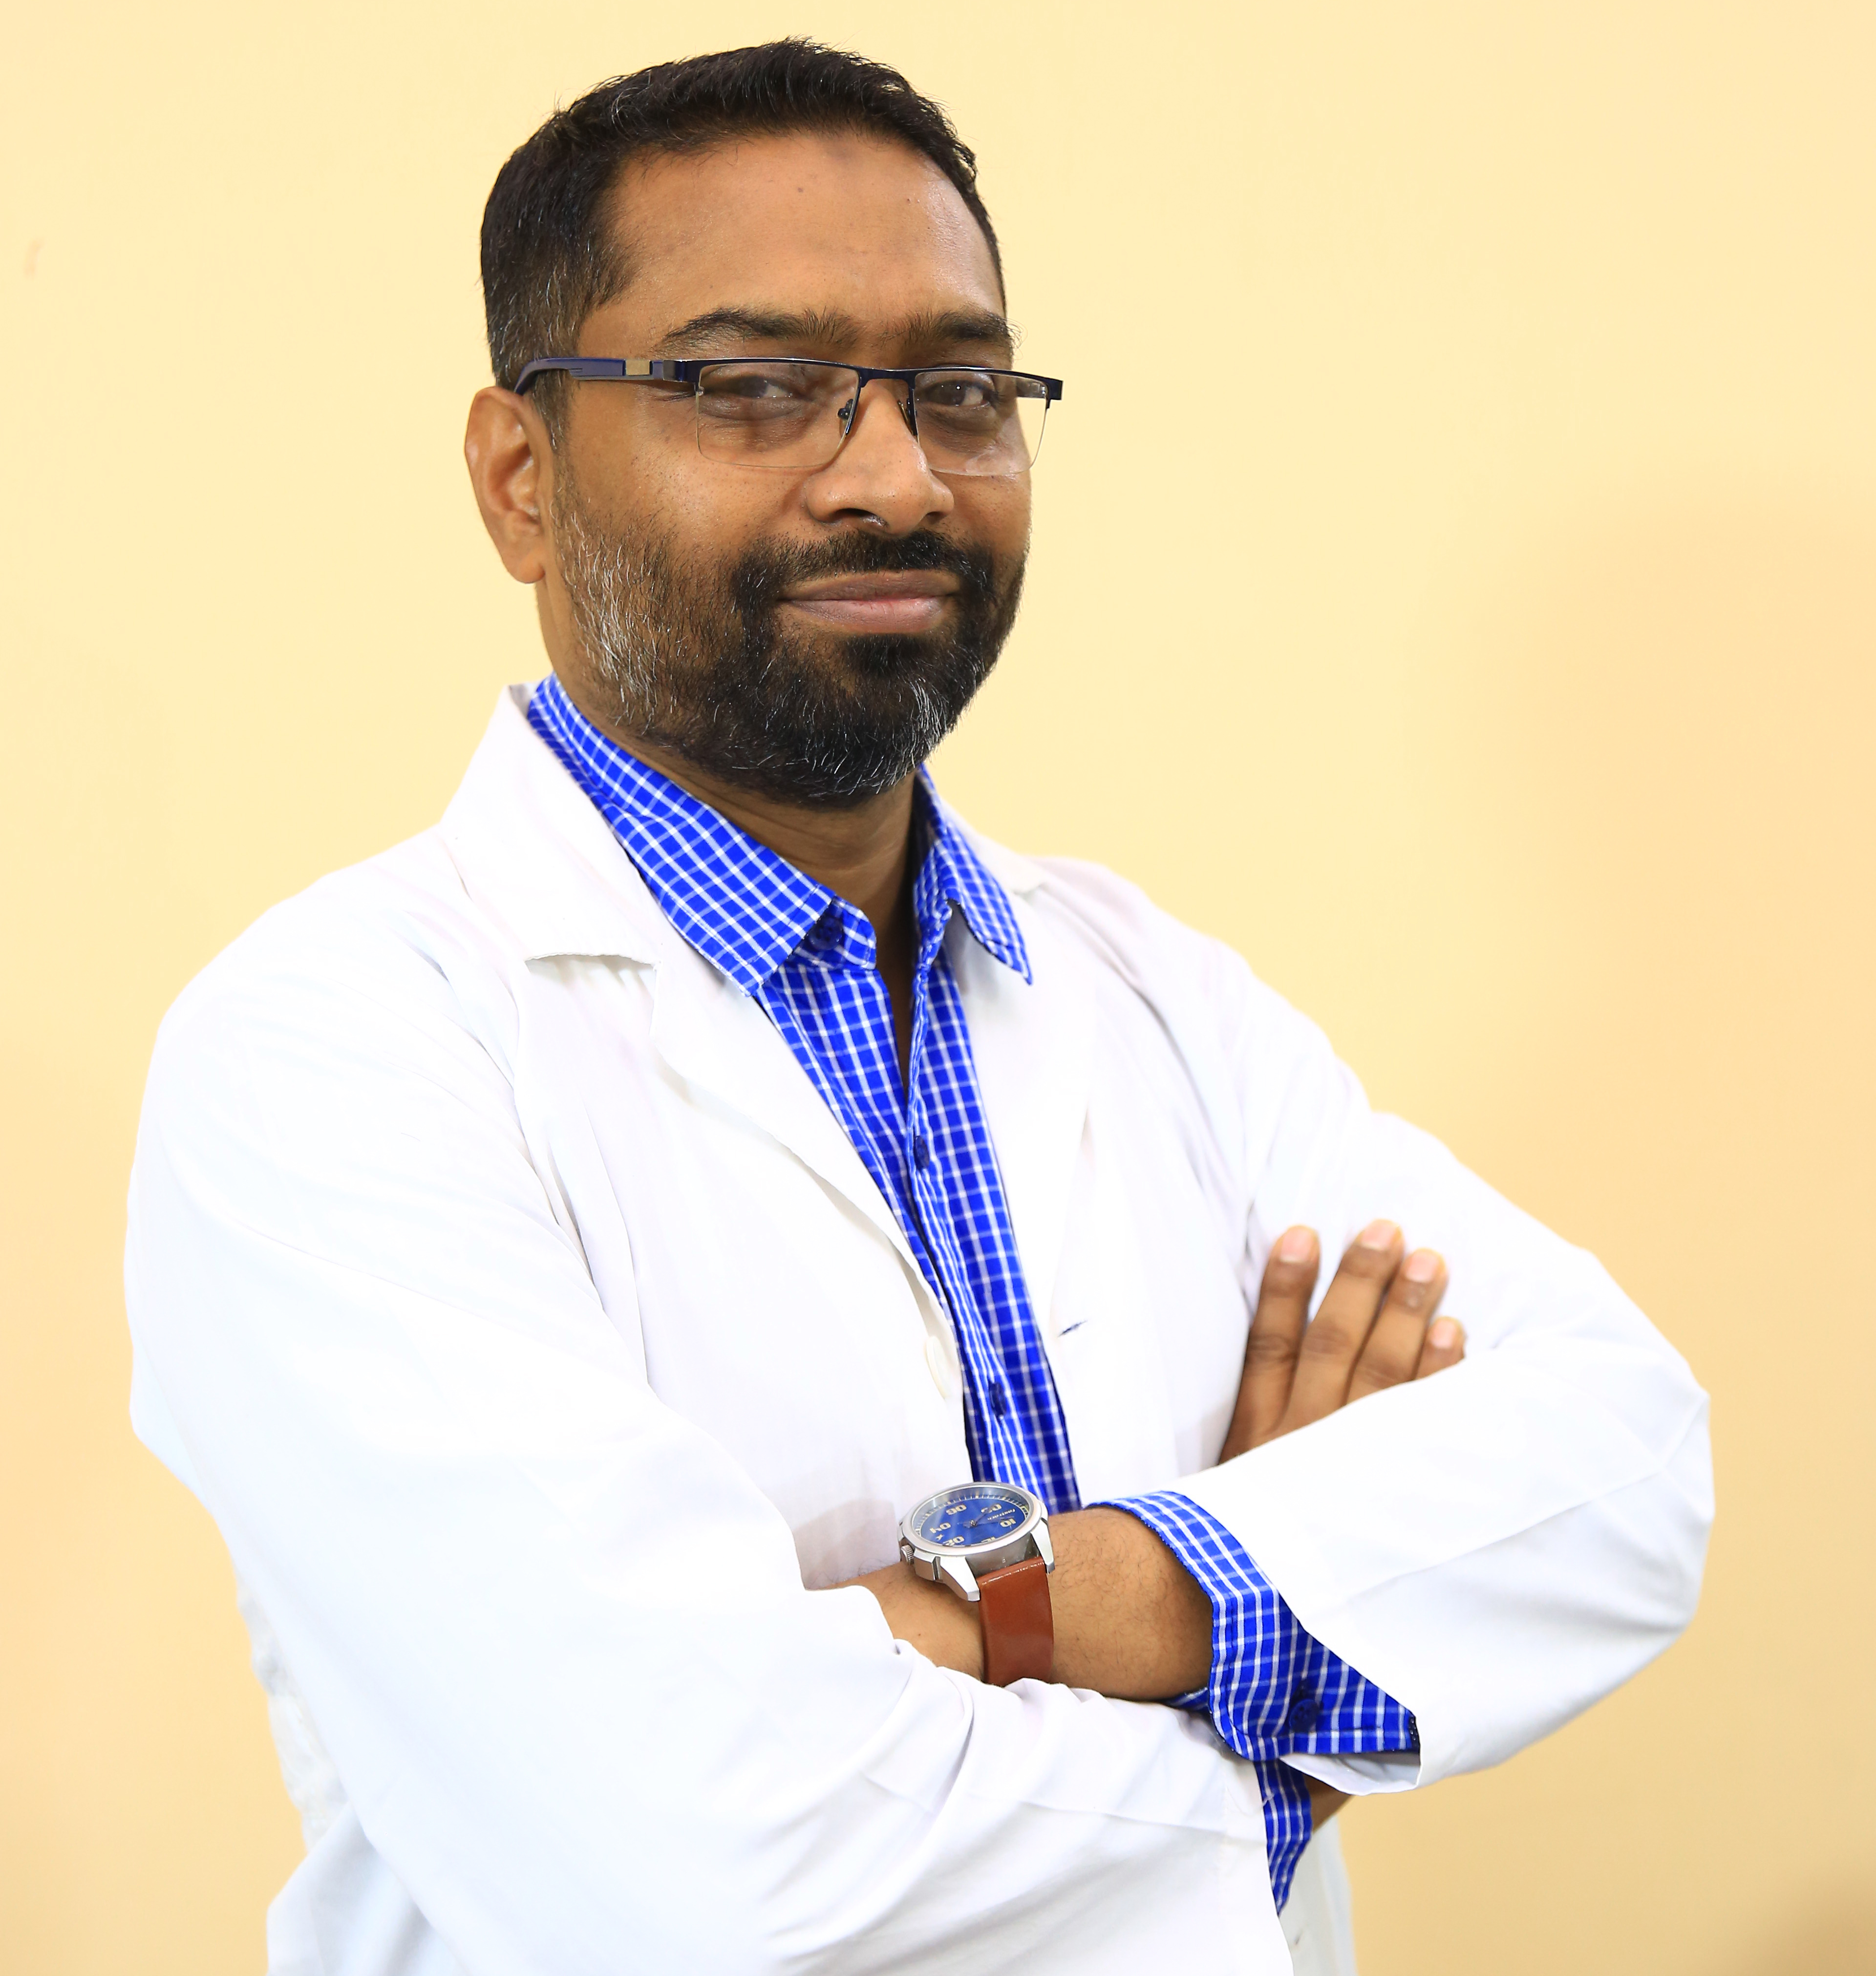 Dr. Muhammad Rafiqul Islam